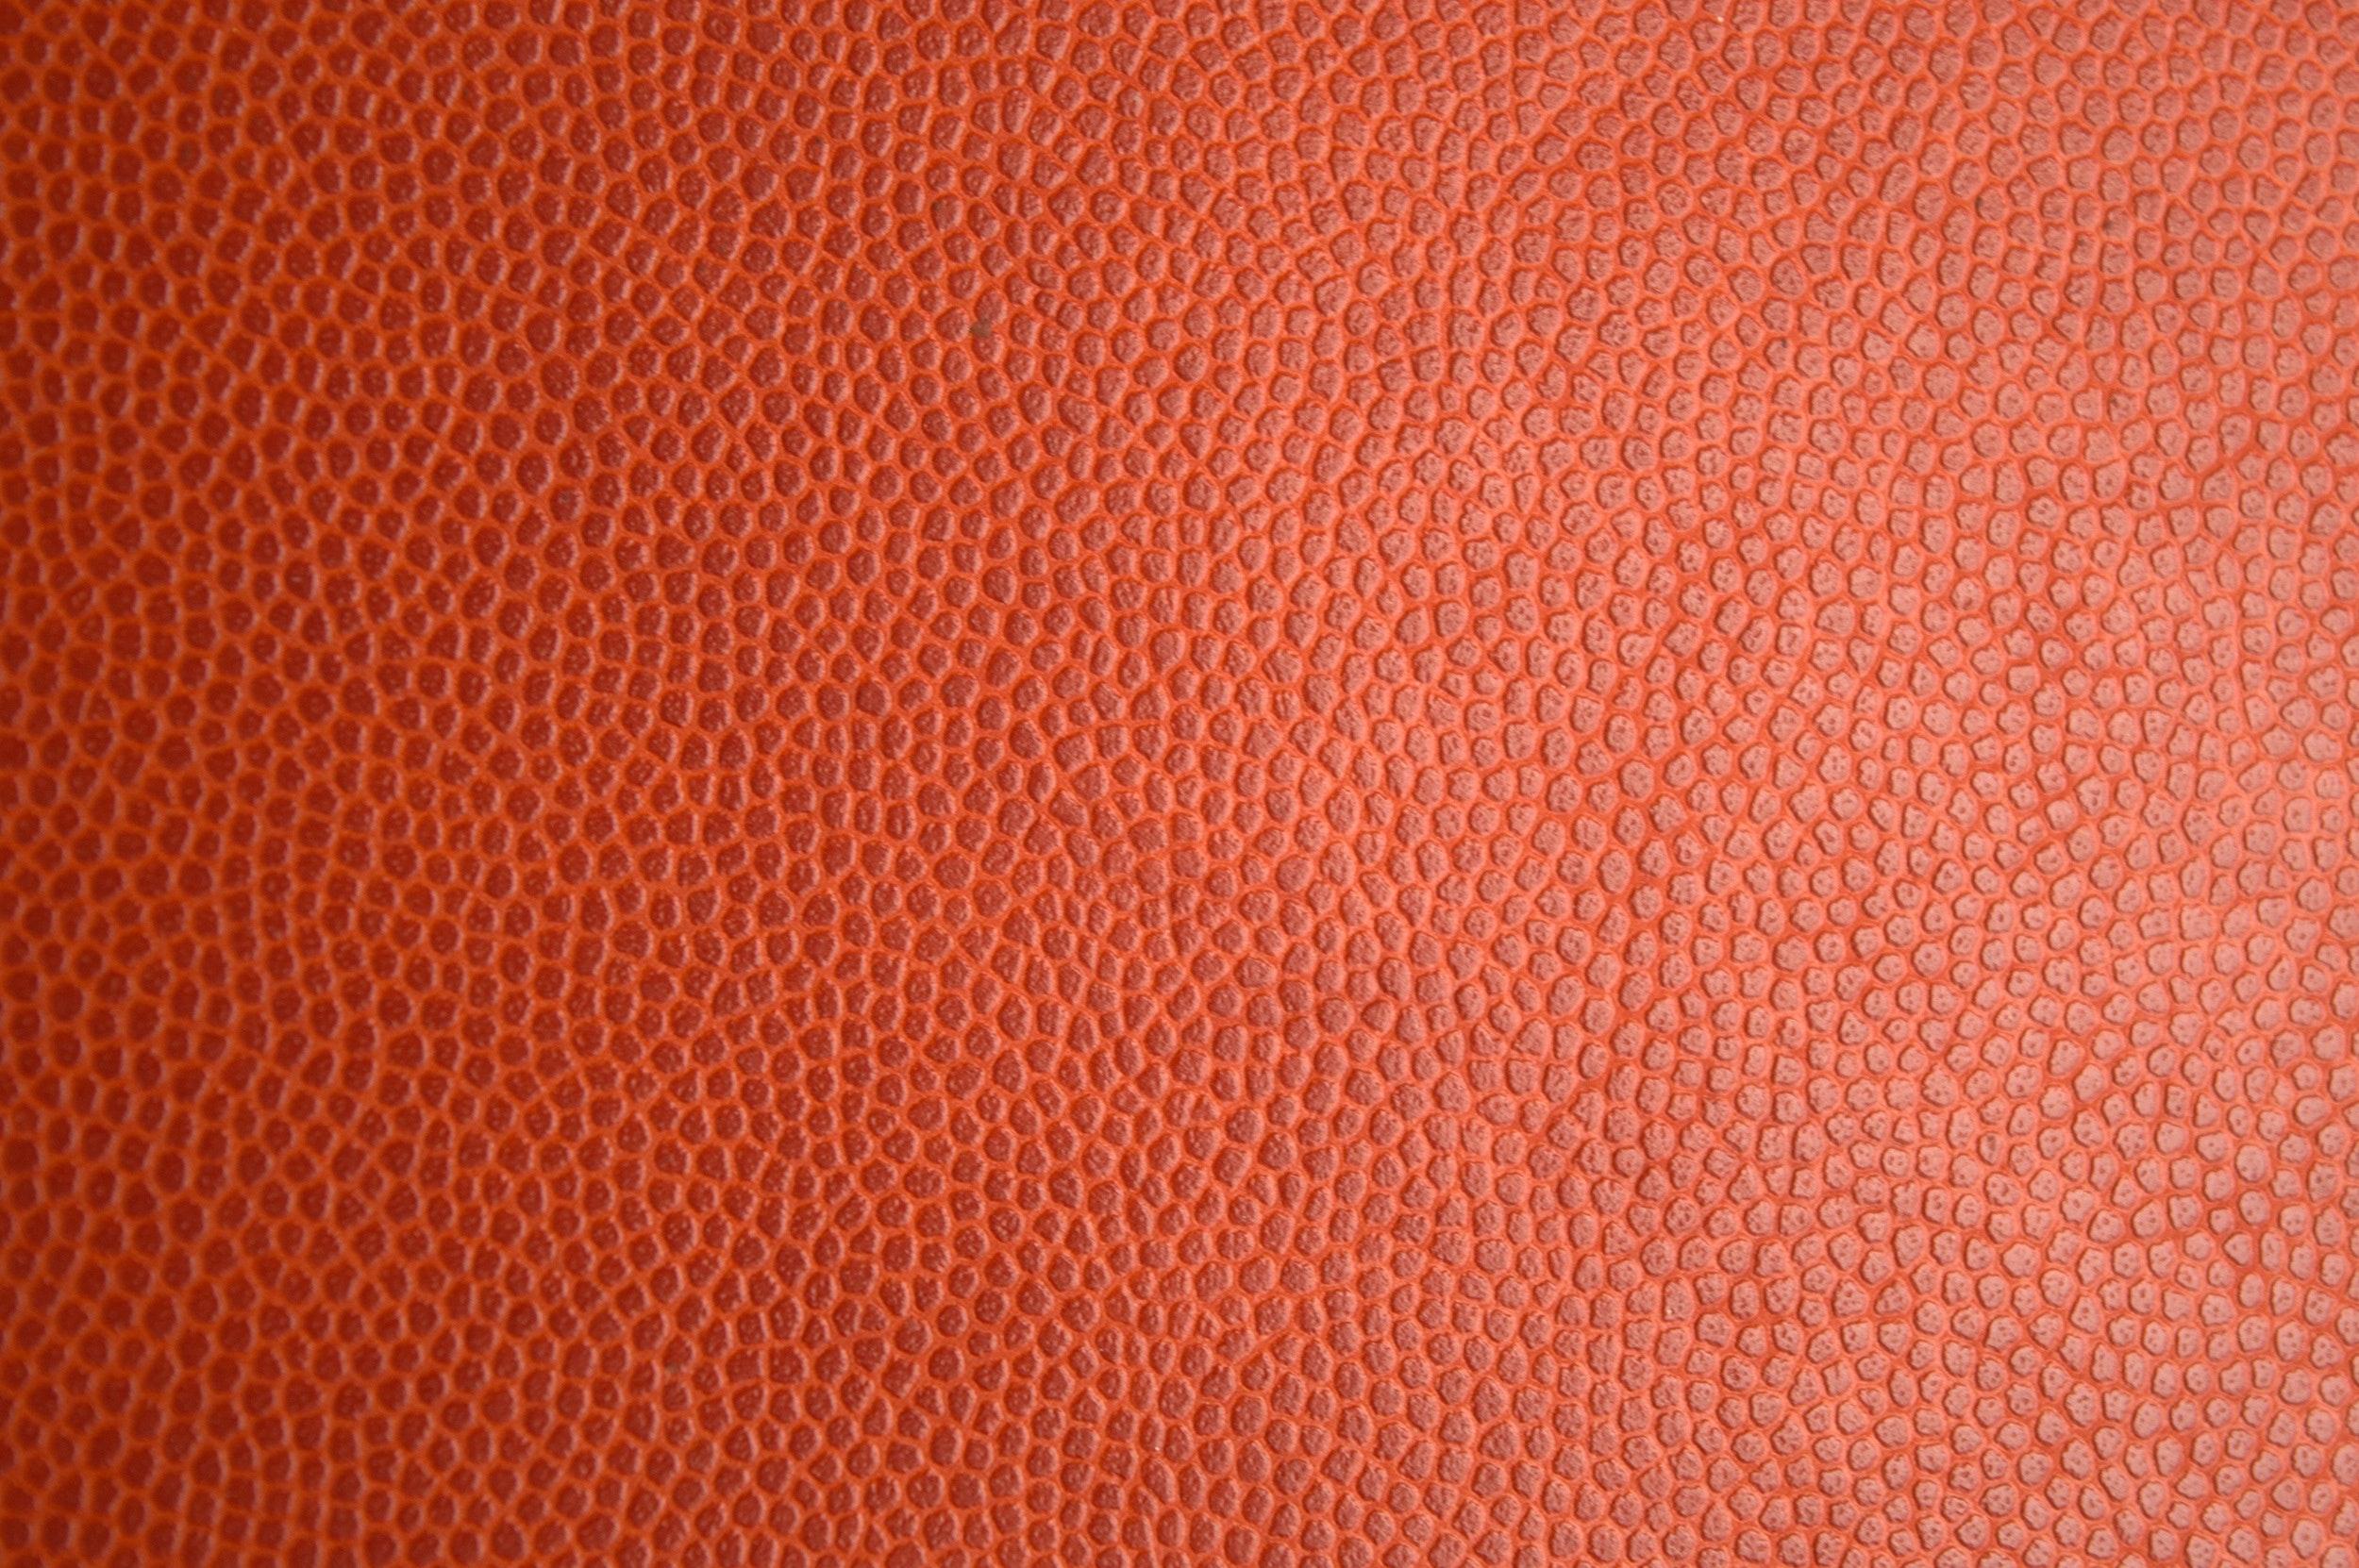 orange-leather-207300